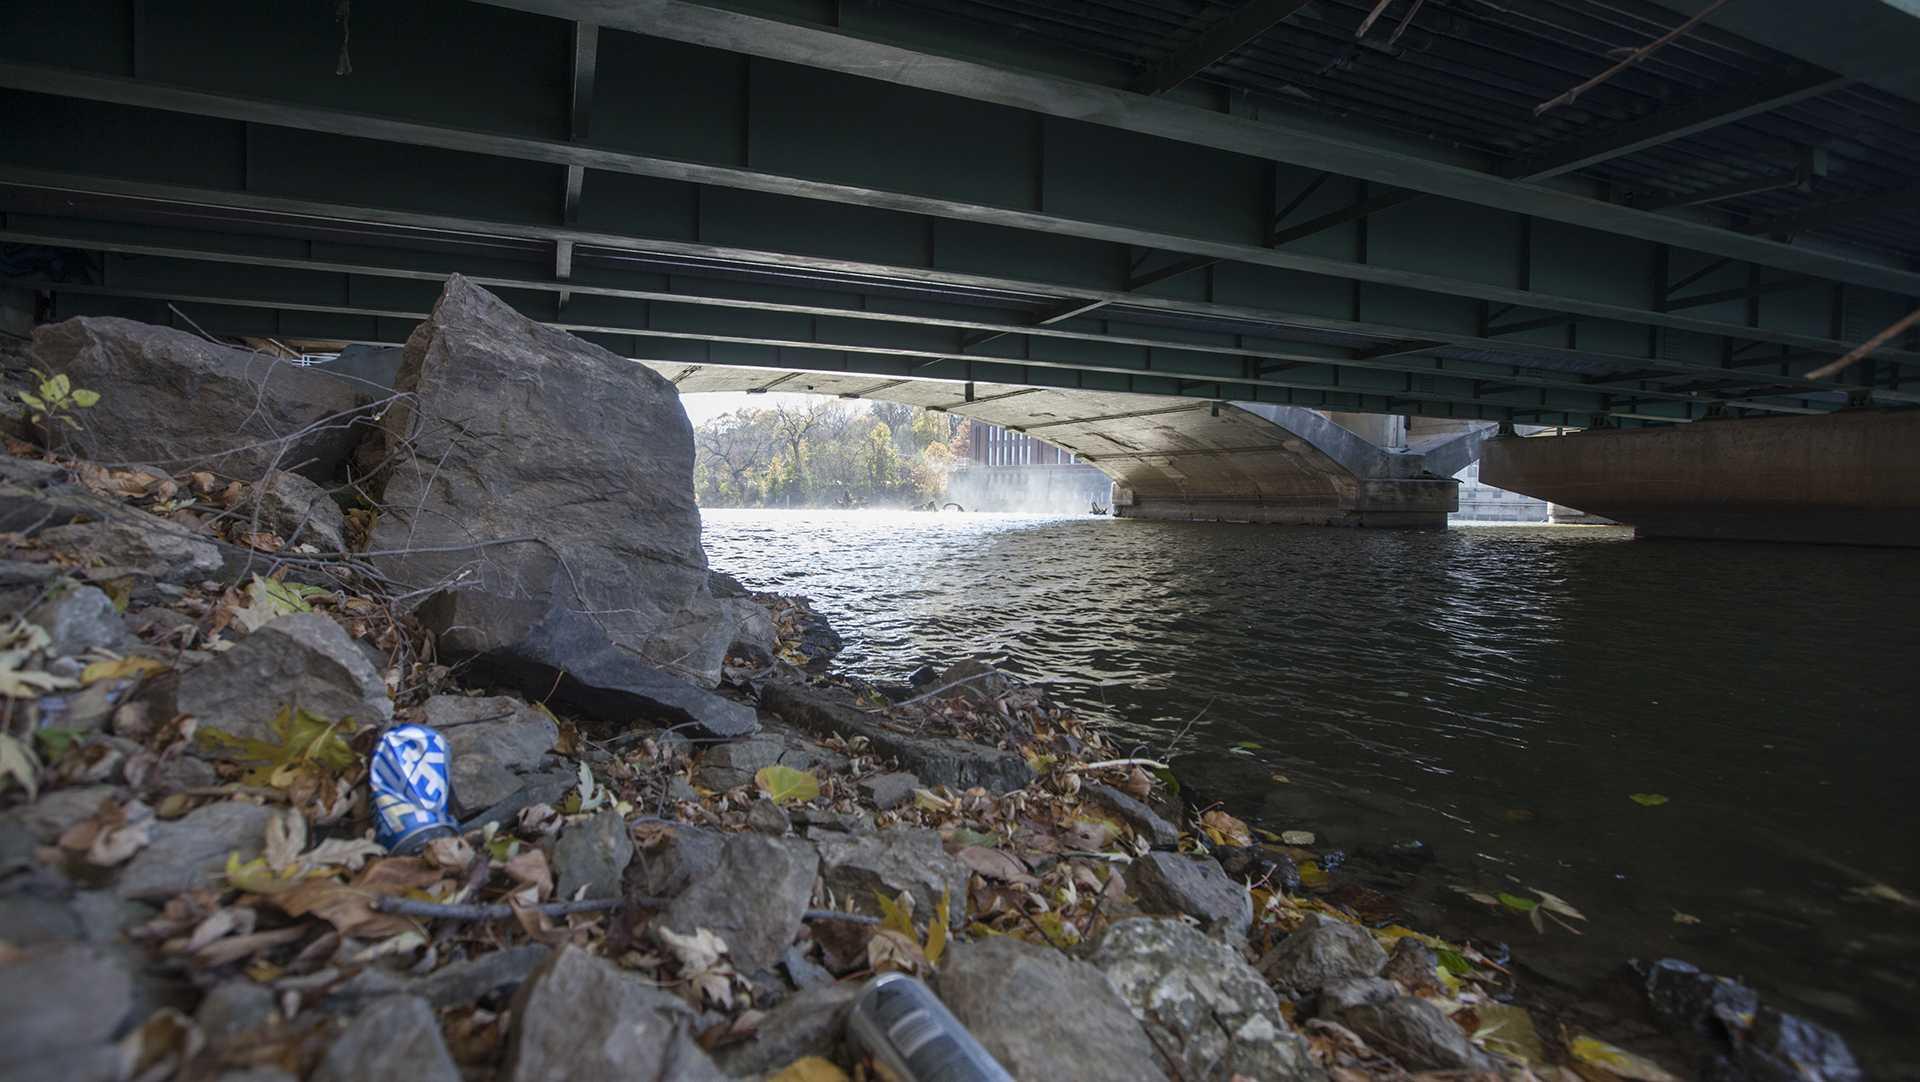 The Iowa River is seen on Thursday, Nov. 9, 2017. (Paxton Corey/The Daily Iowan)